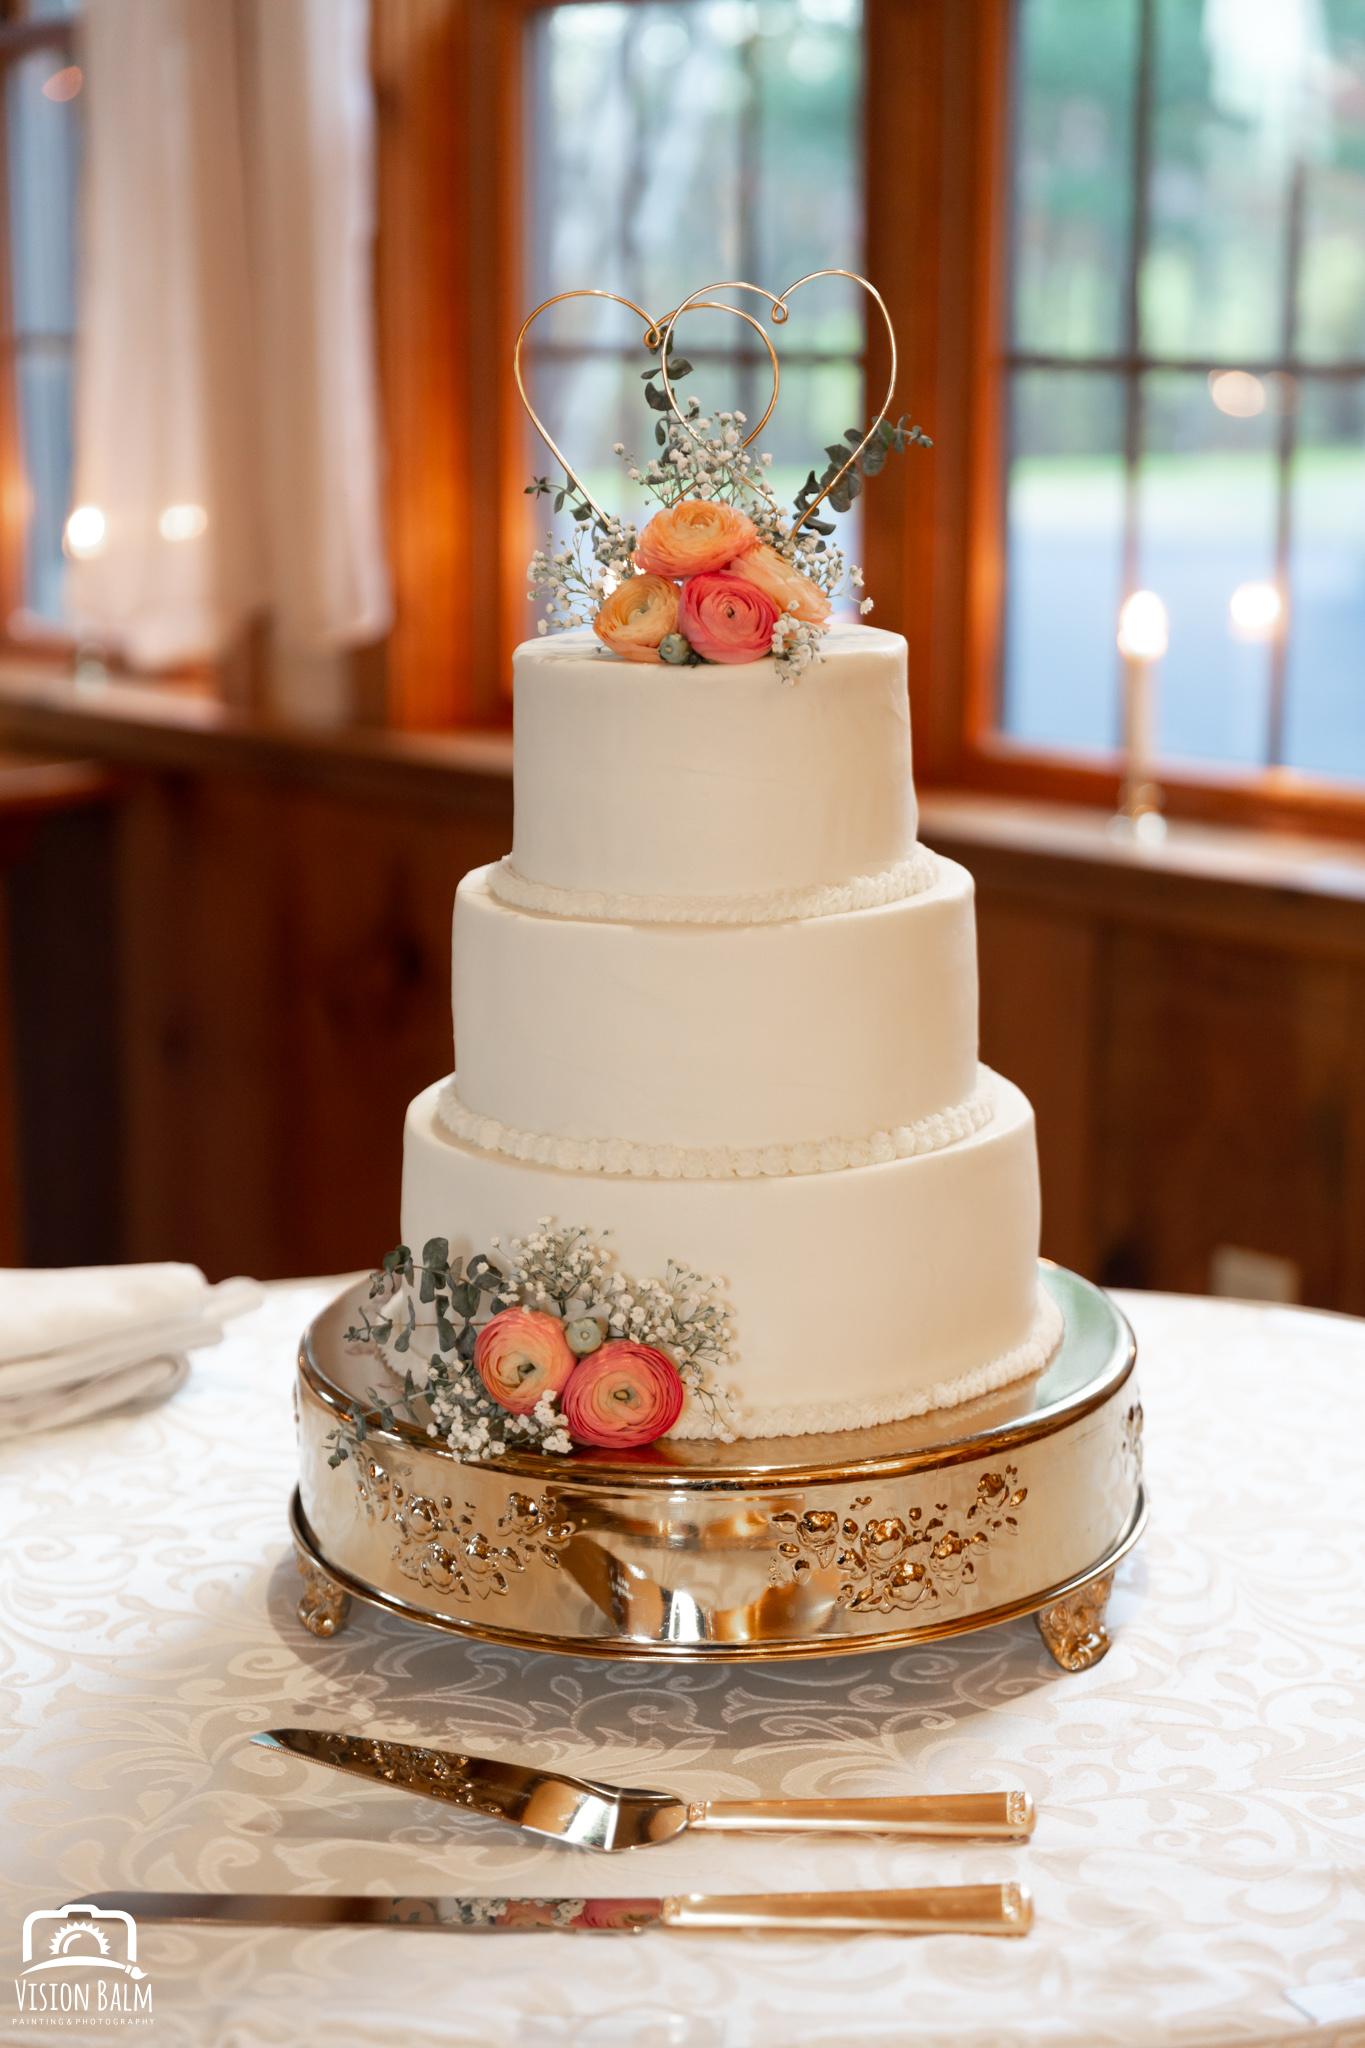 Wedding photo of wedding cake in the venue of Zuka's Hilltop Barn by Vision Balm in Charleston, SC.